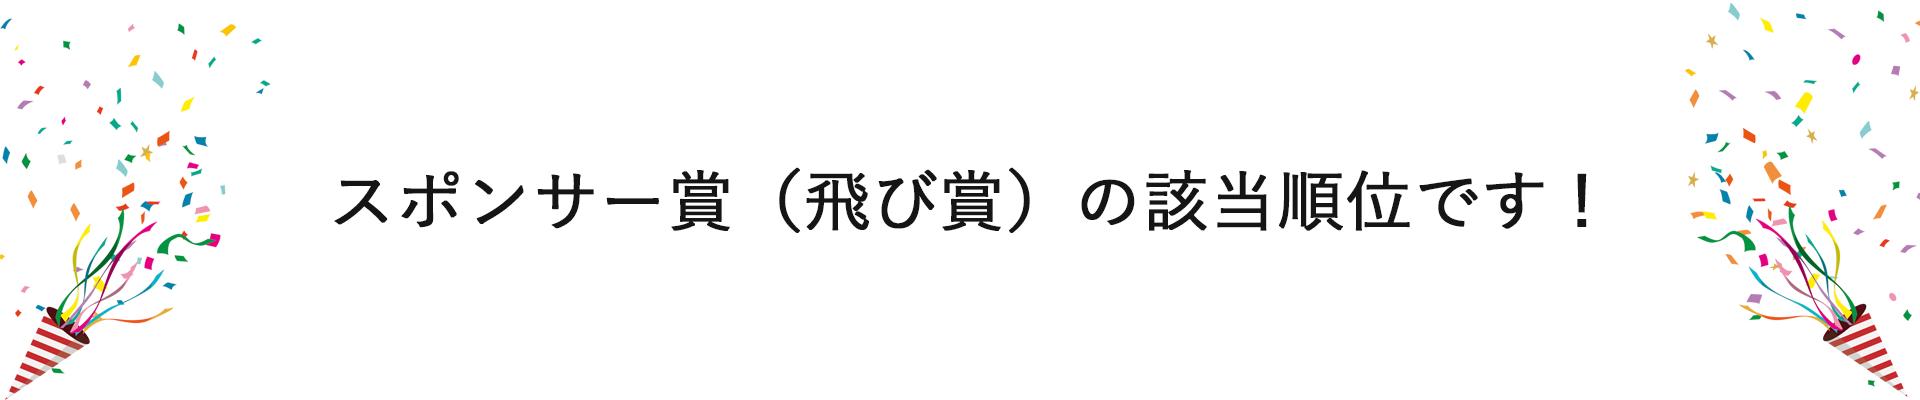 spon_n